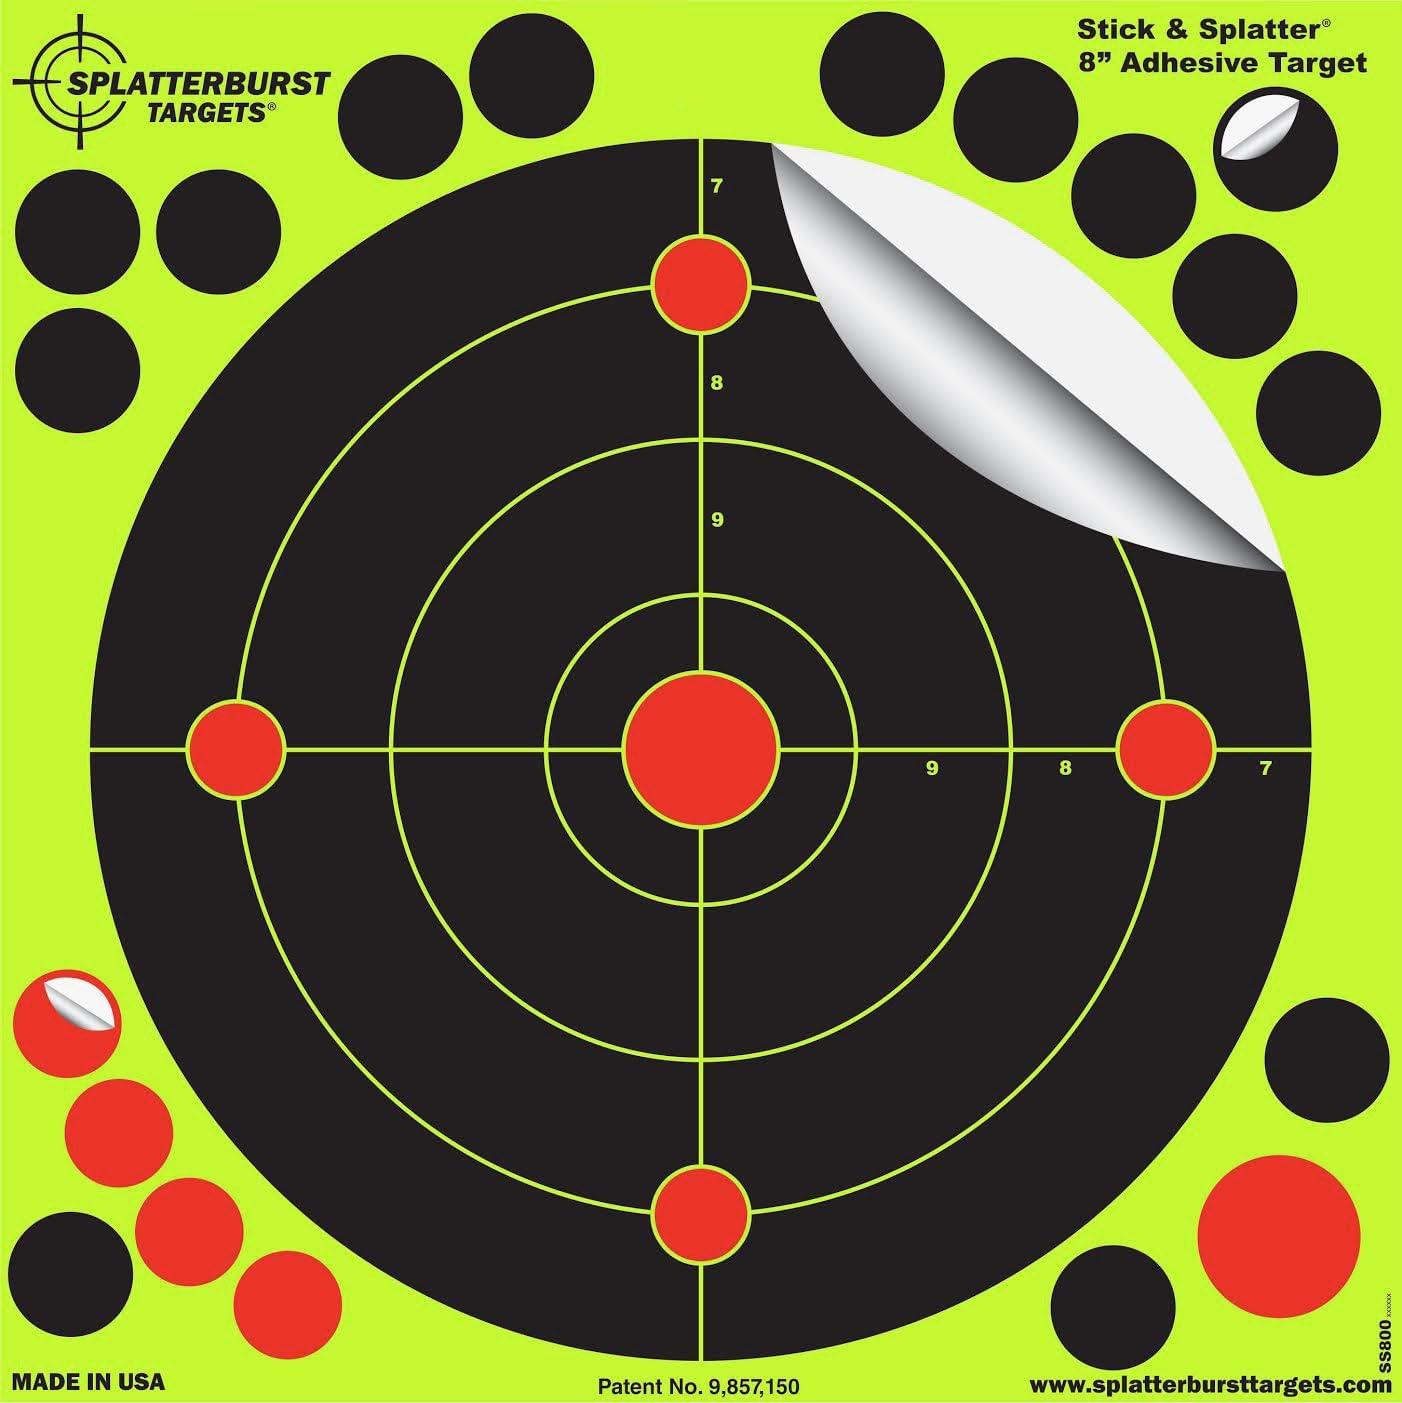 /Pistola/ splatterburst Objetivos/ /Pistola/ /8/Inch Adhesivo Stick /& Salpicaduras reactiva Objetivos de Disparo/ /Rifle/ /BB//&nd /Pistola de Airsoft/